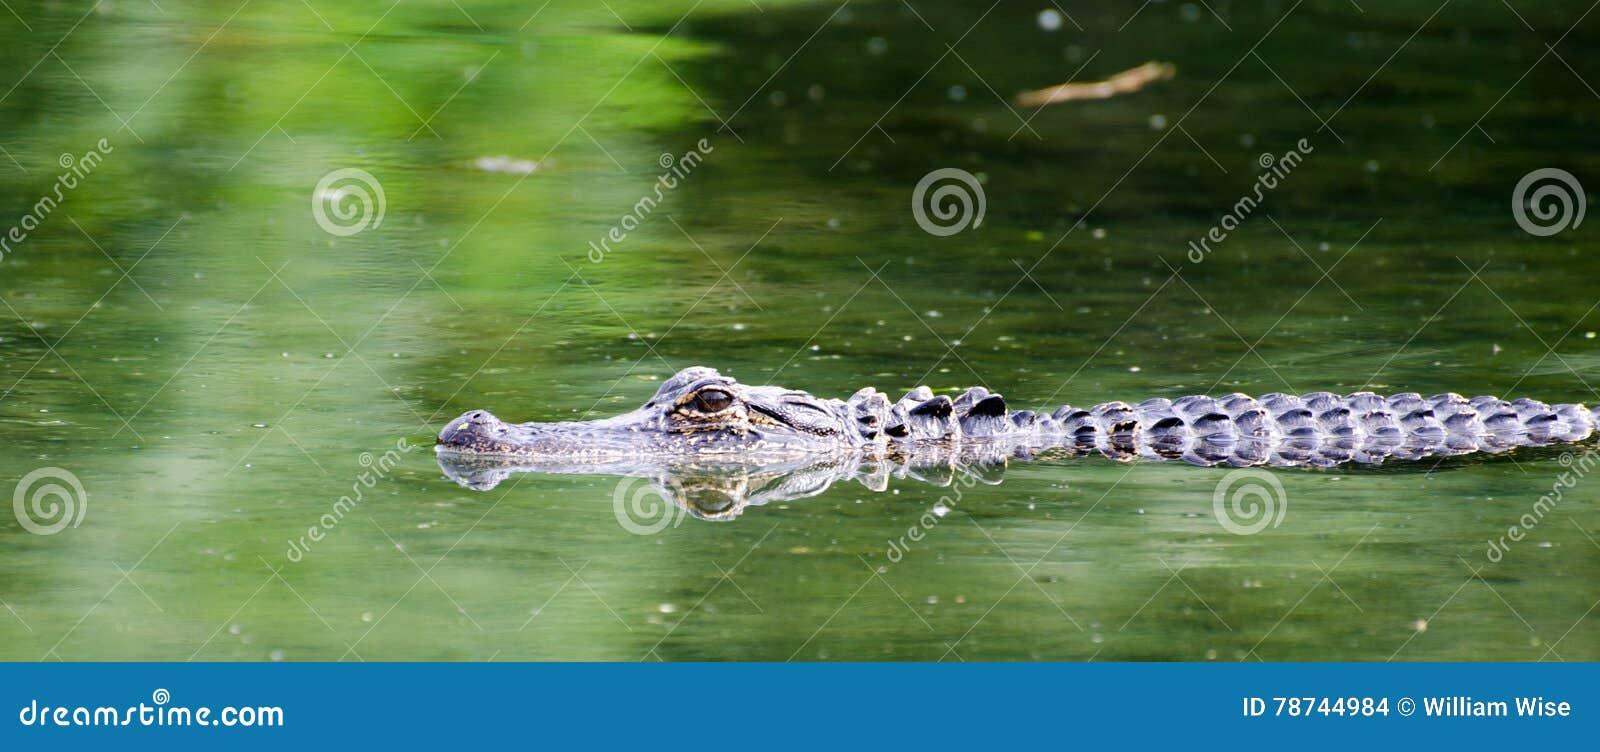 Alligator Magnolia Springs State Park